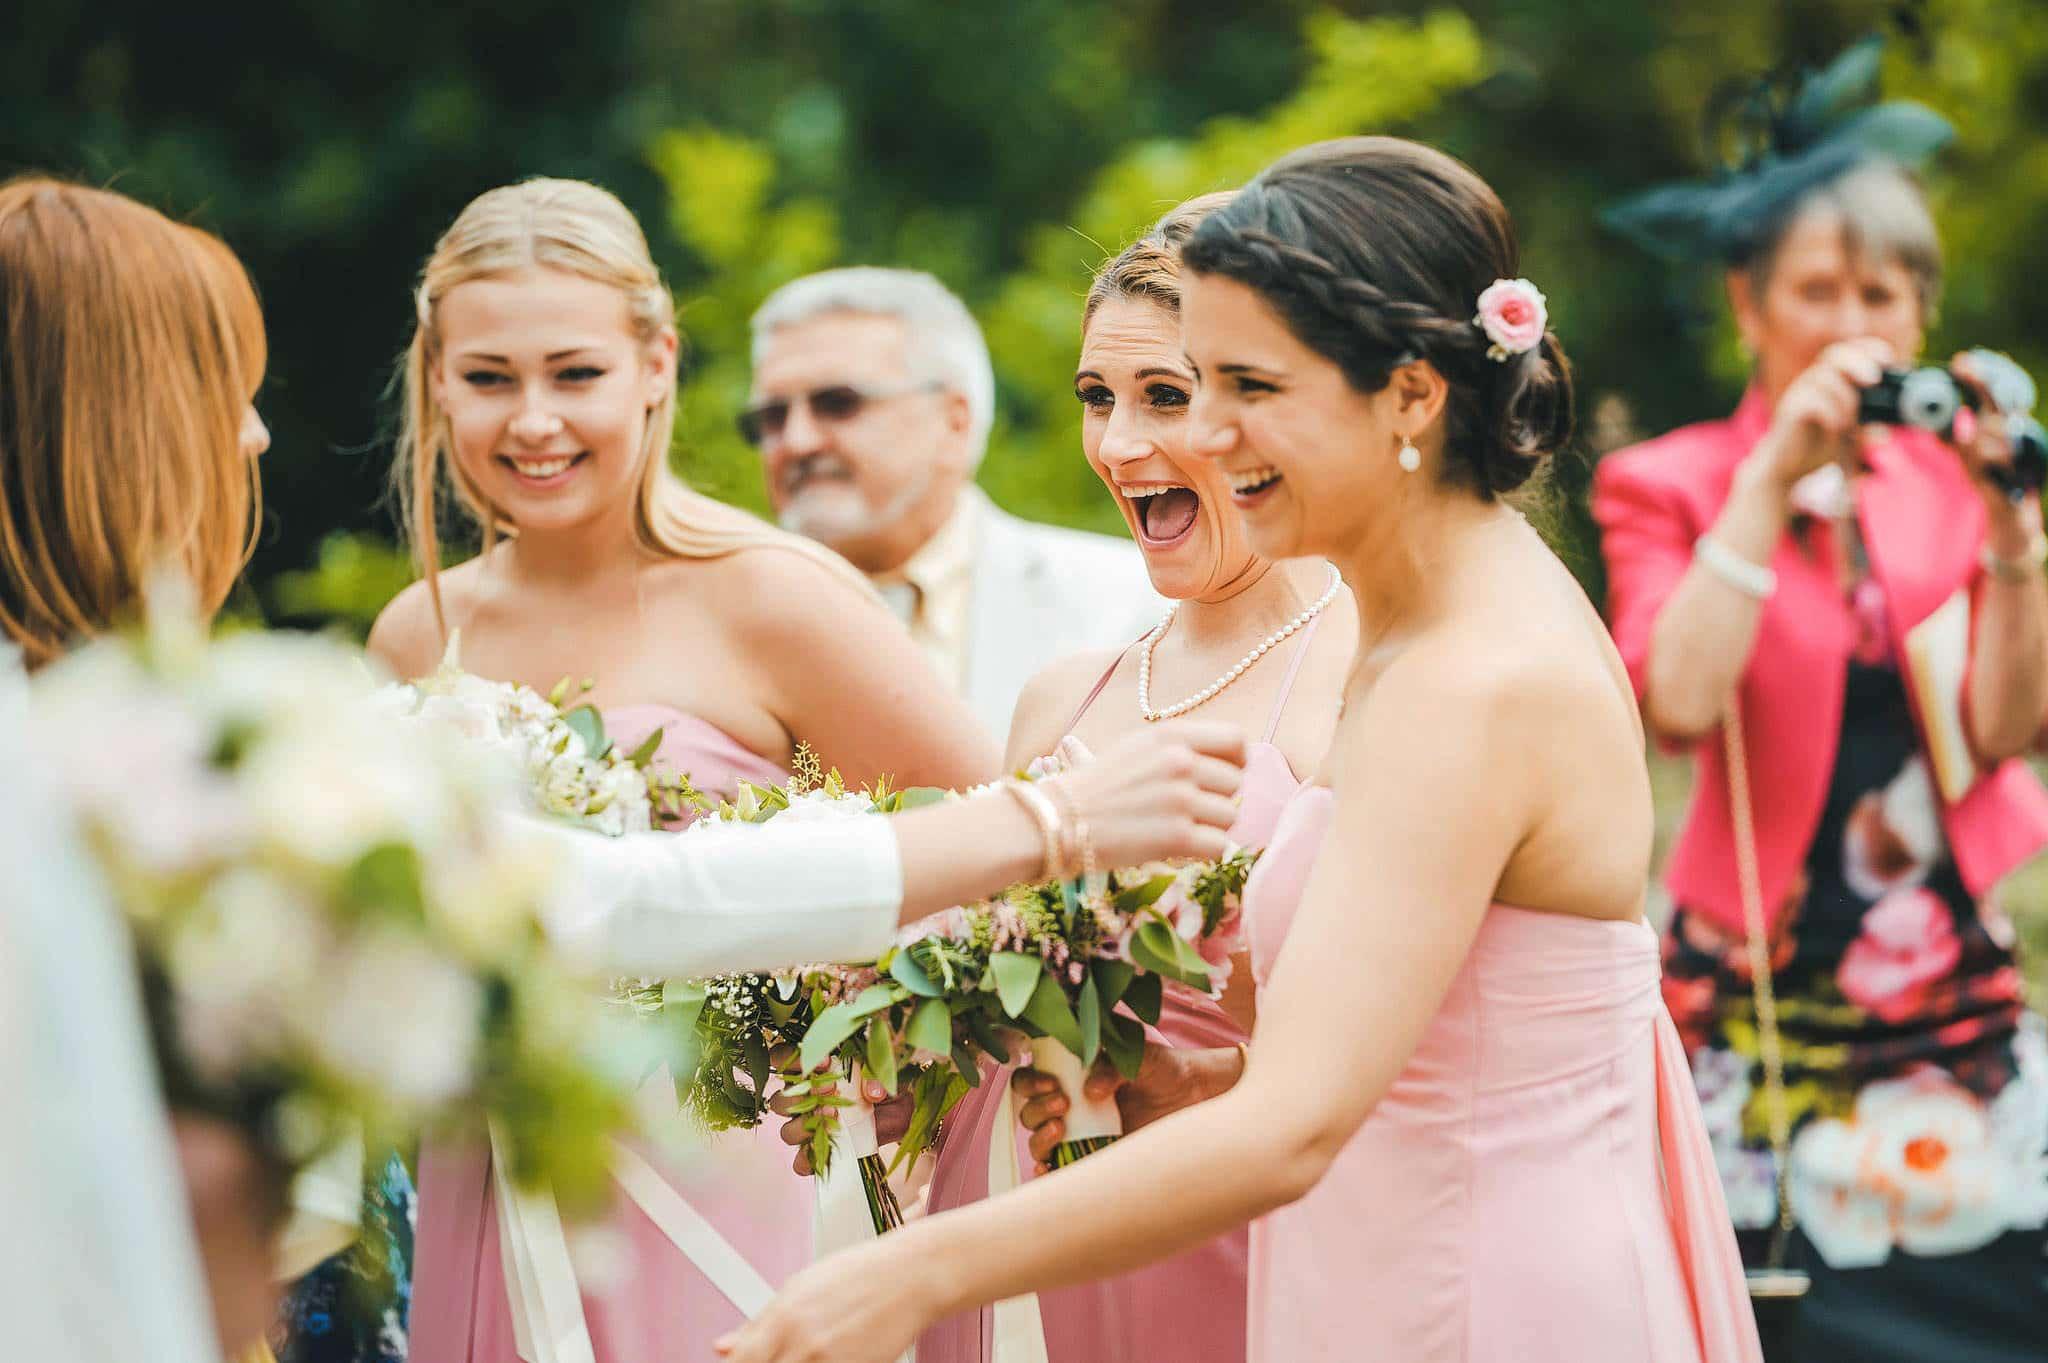 wedding photography midlands 34 - Midlands wedding photography - 2015 Review